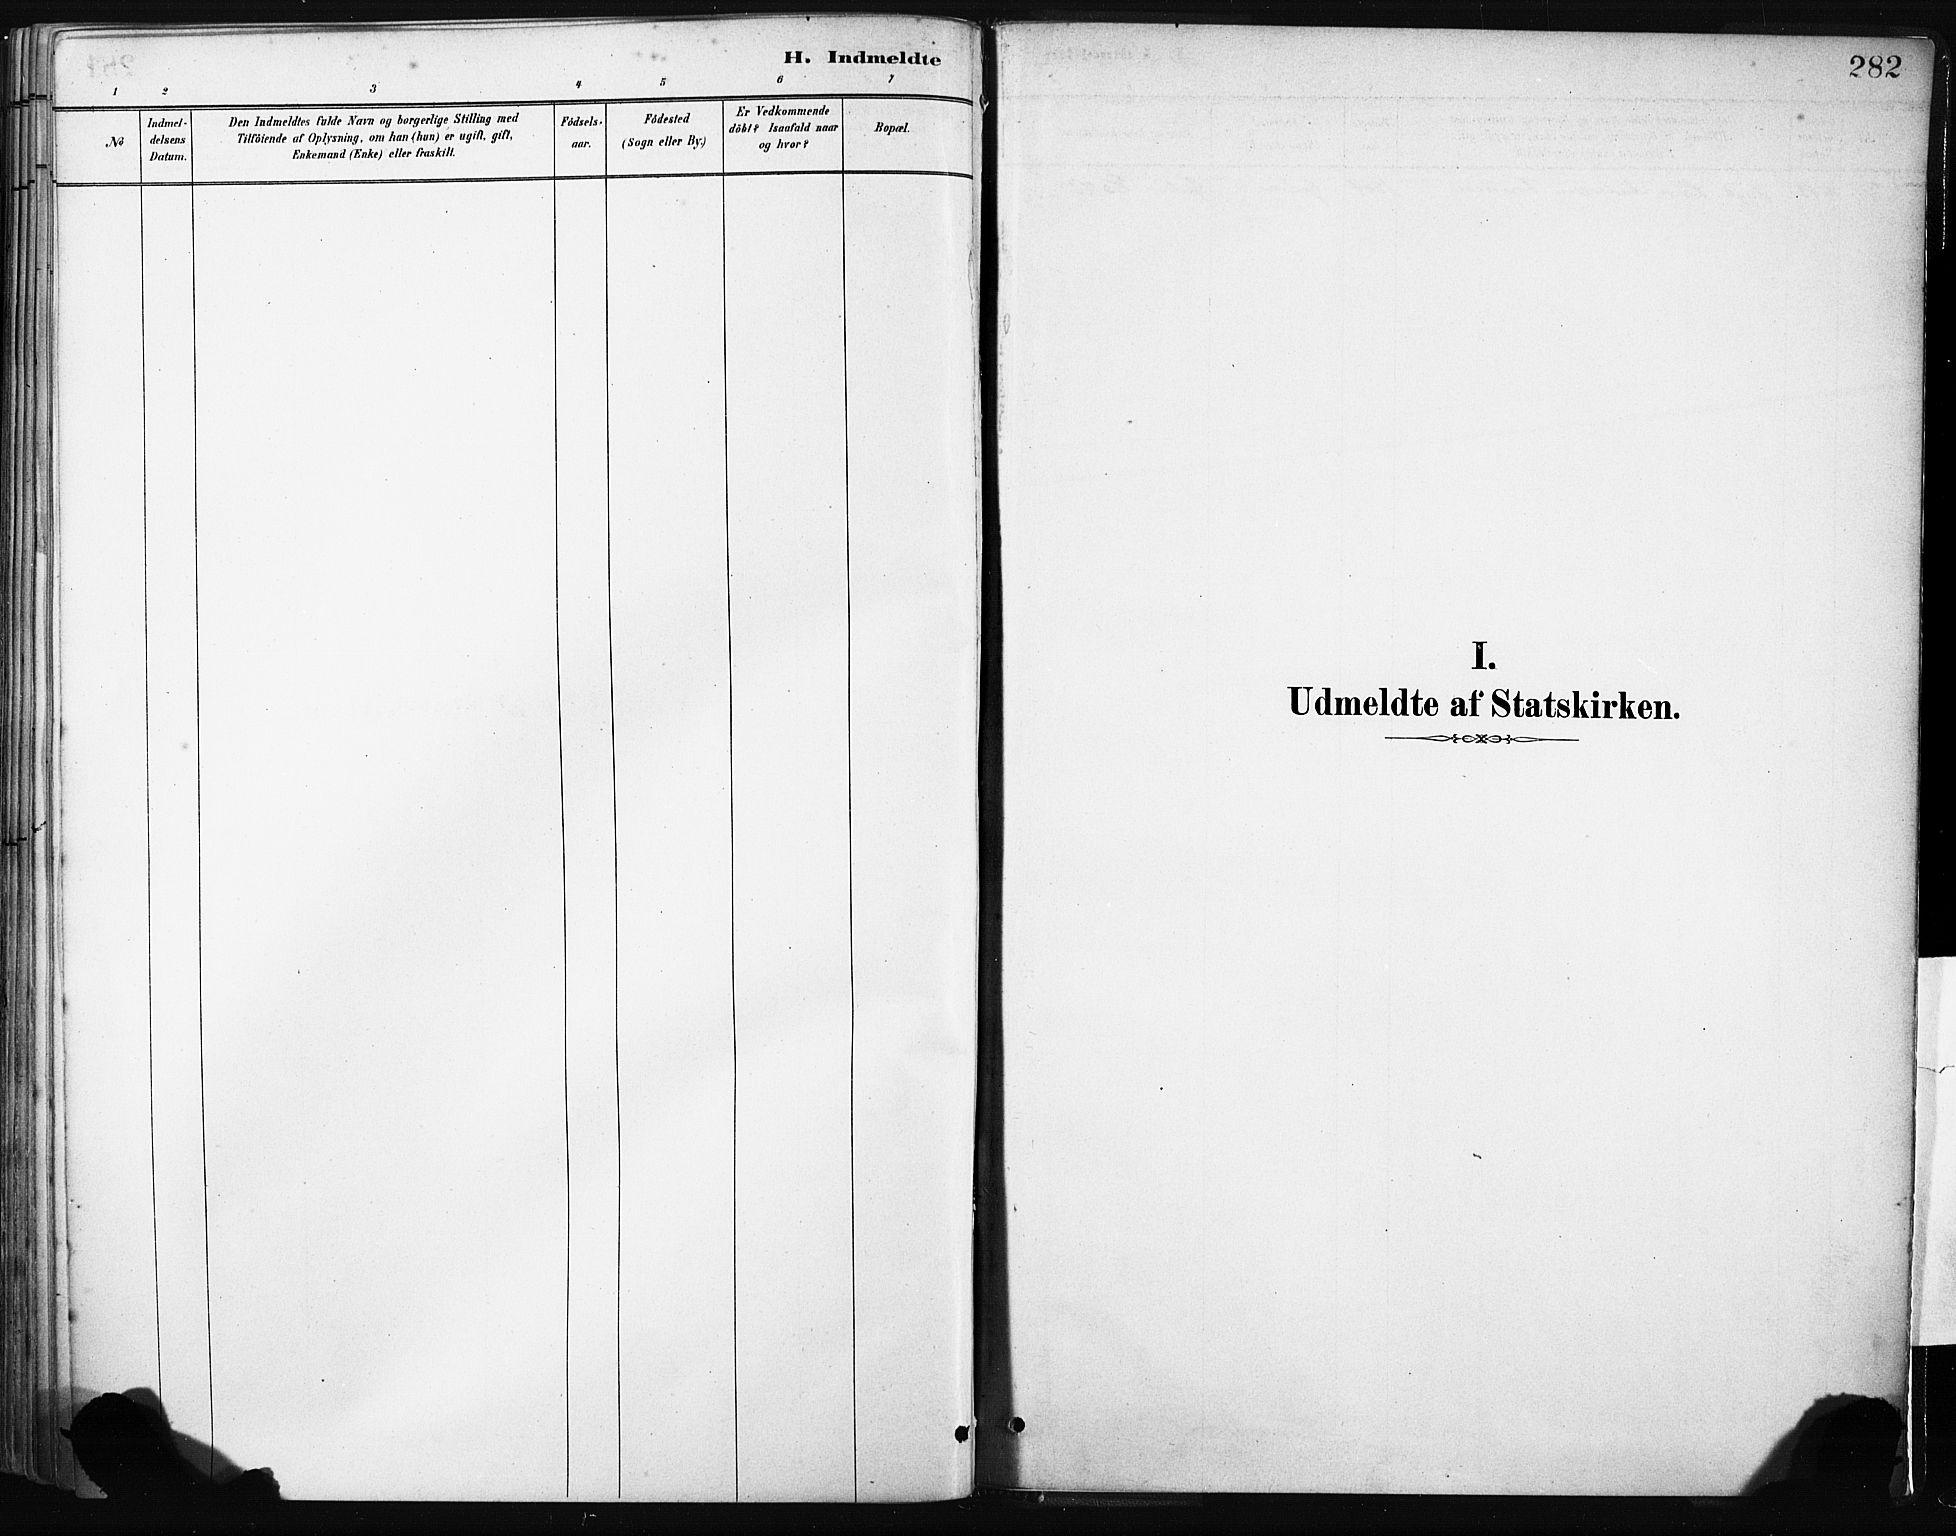 SAB, Gulen Sokneprestembete, Ministerialbok nr. B 1, 1881-1905, s. 282